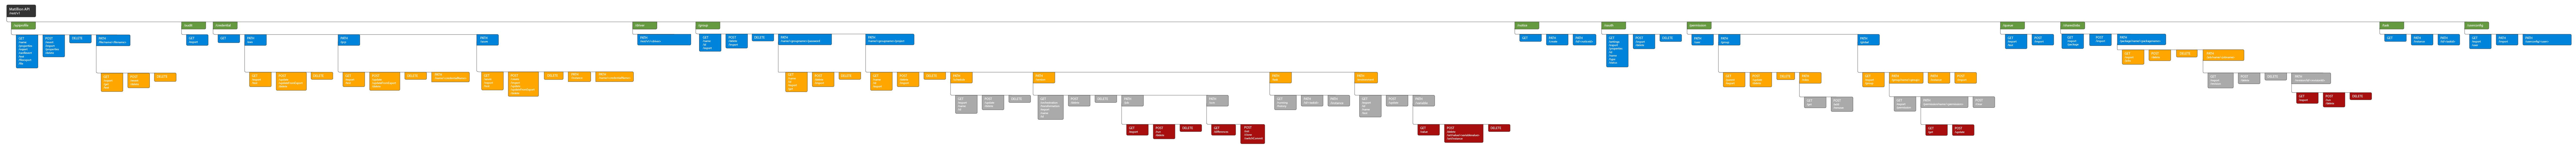 Matillion ETL API v1 Endpoints- Flow